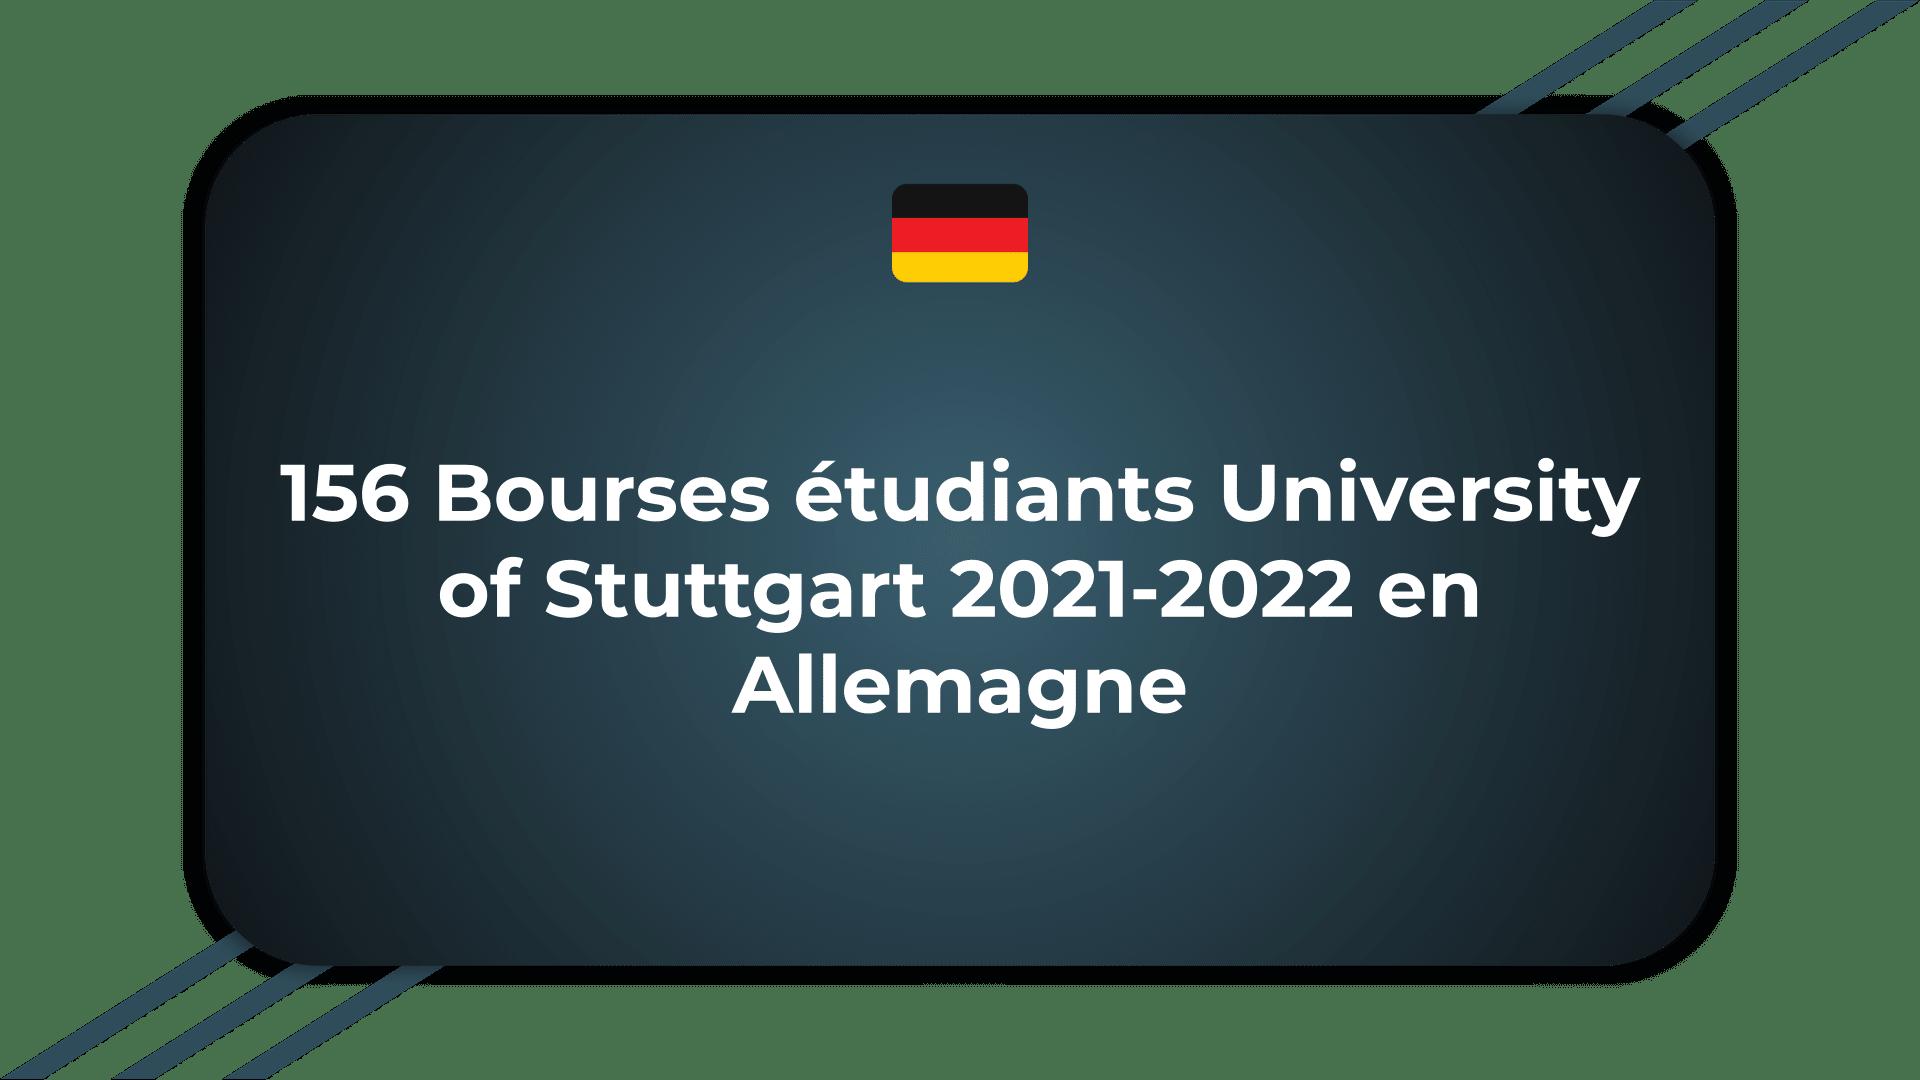 Bourses étudiants University of Stuttgart